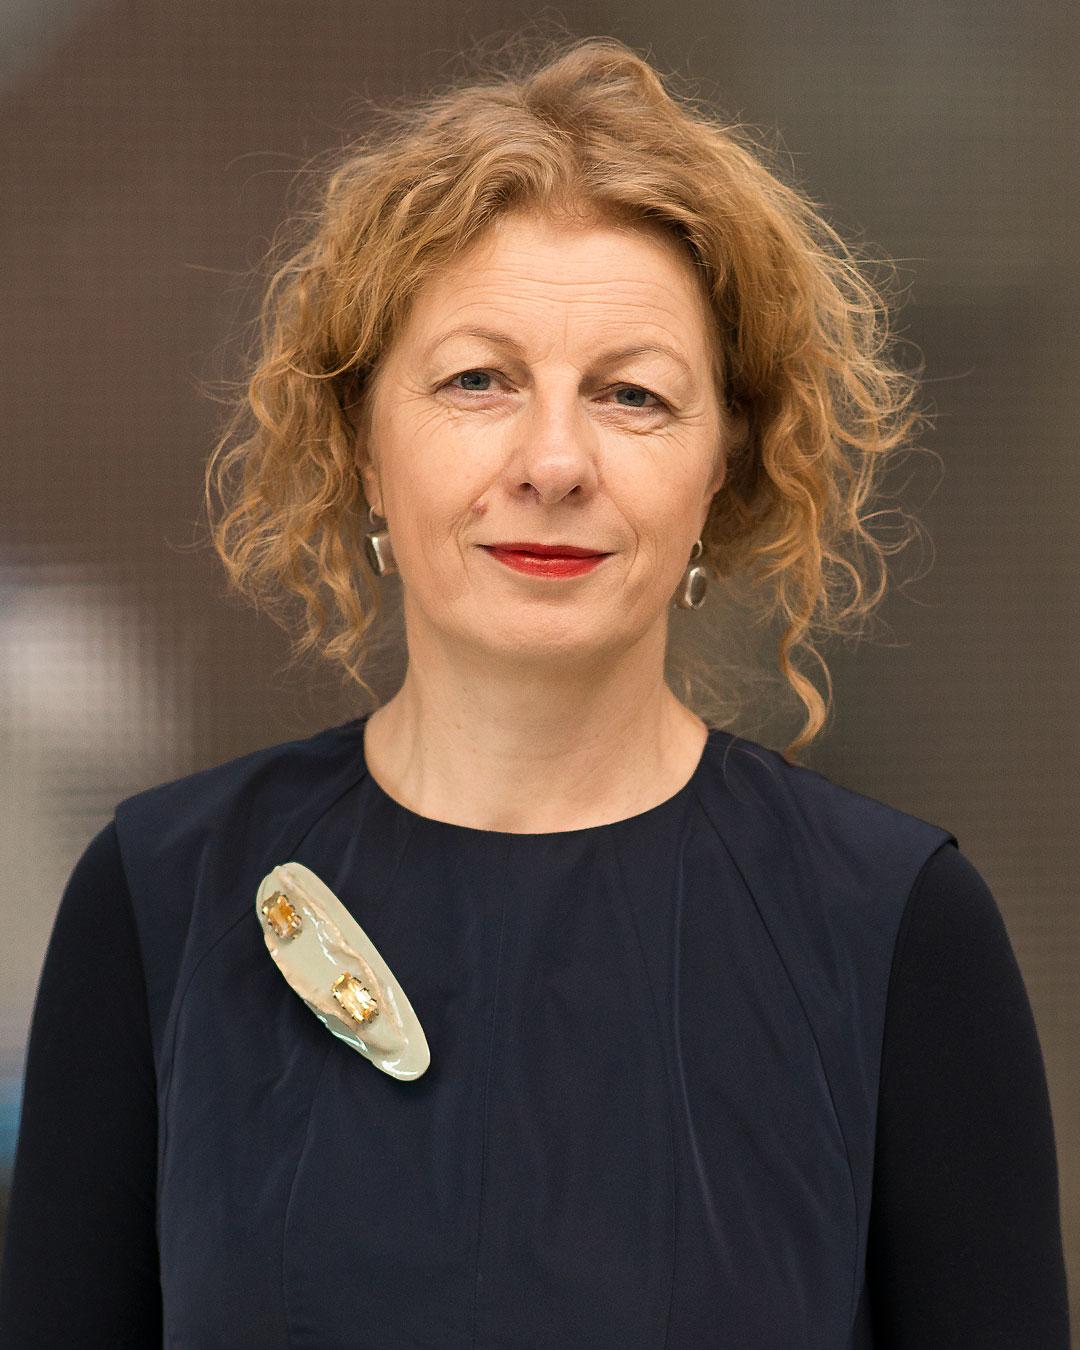 Margit Jäschke, 2016